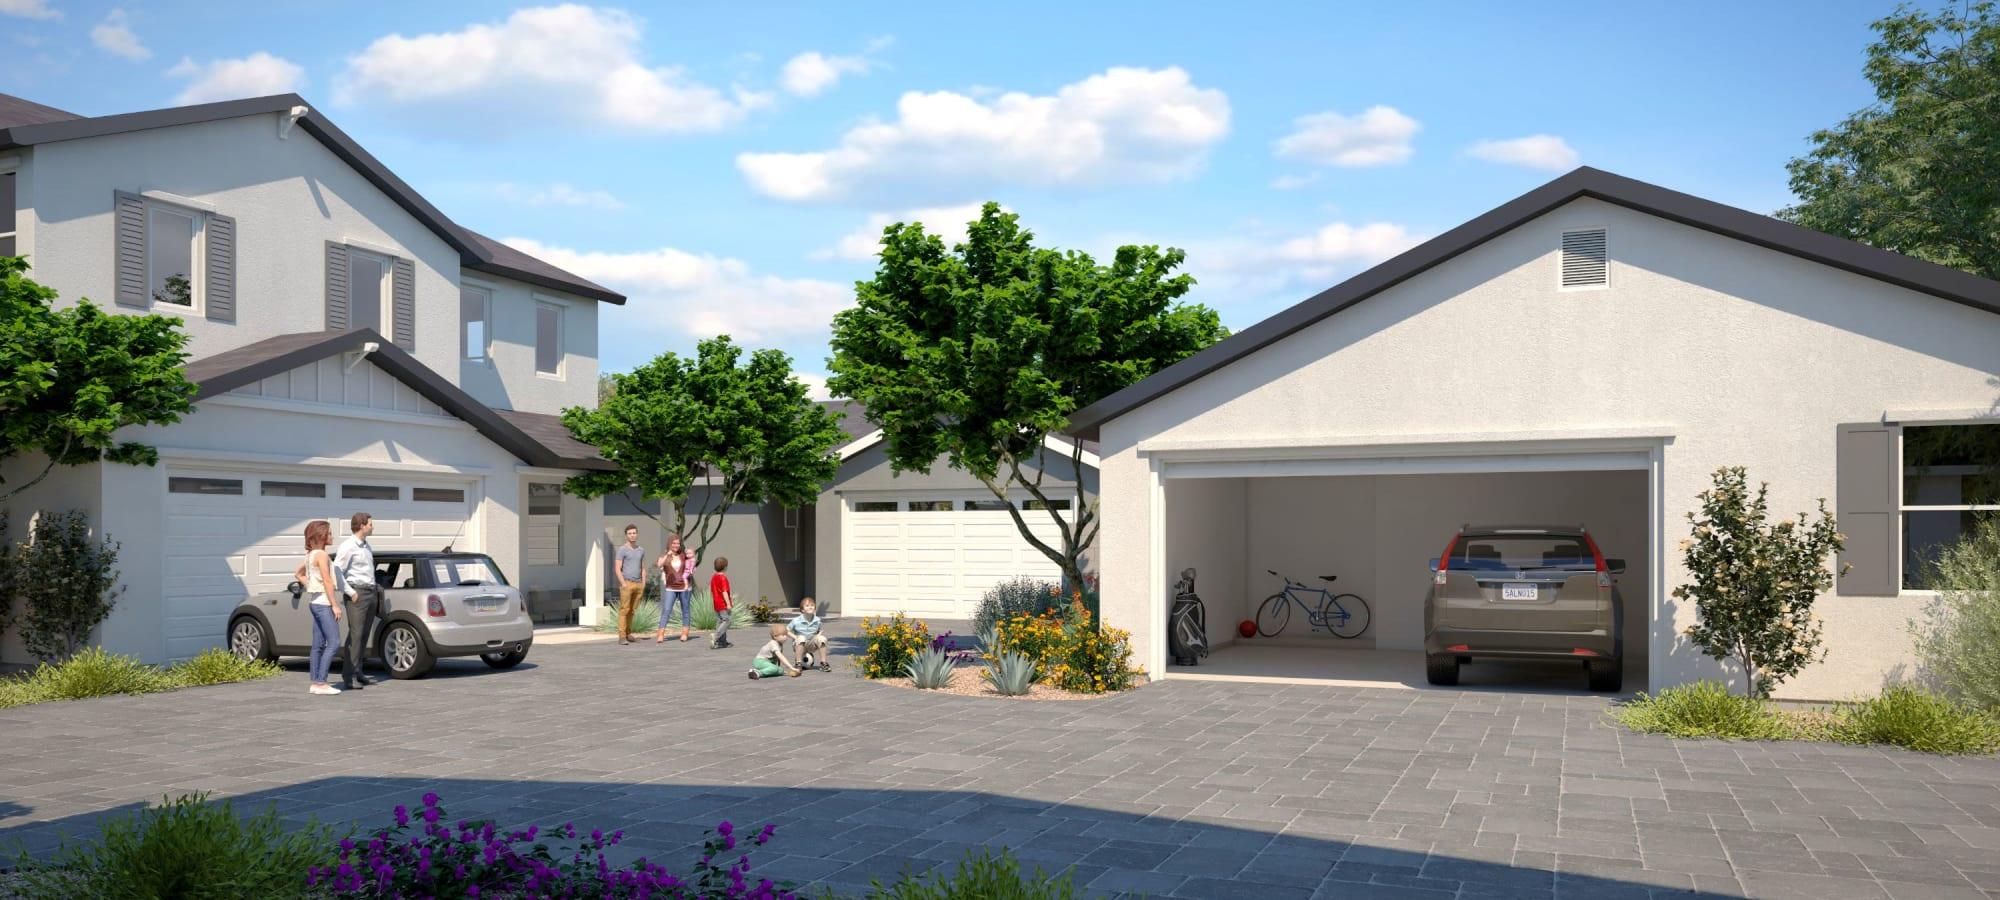 Driveways and garages at Cyrene at Estrella in Goodyear, Arizona